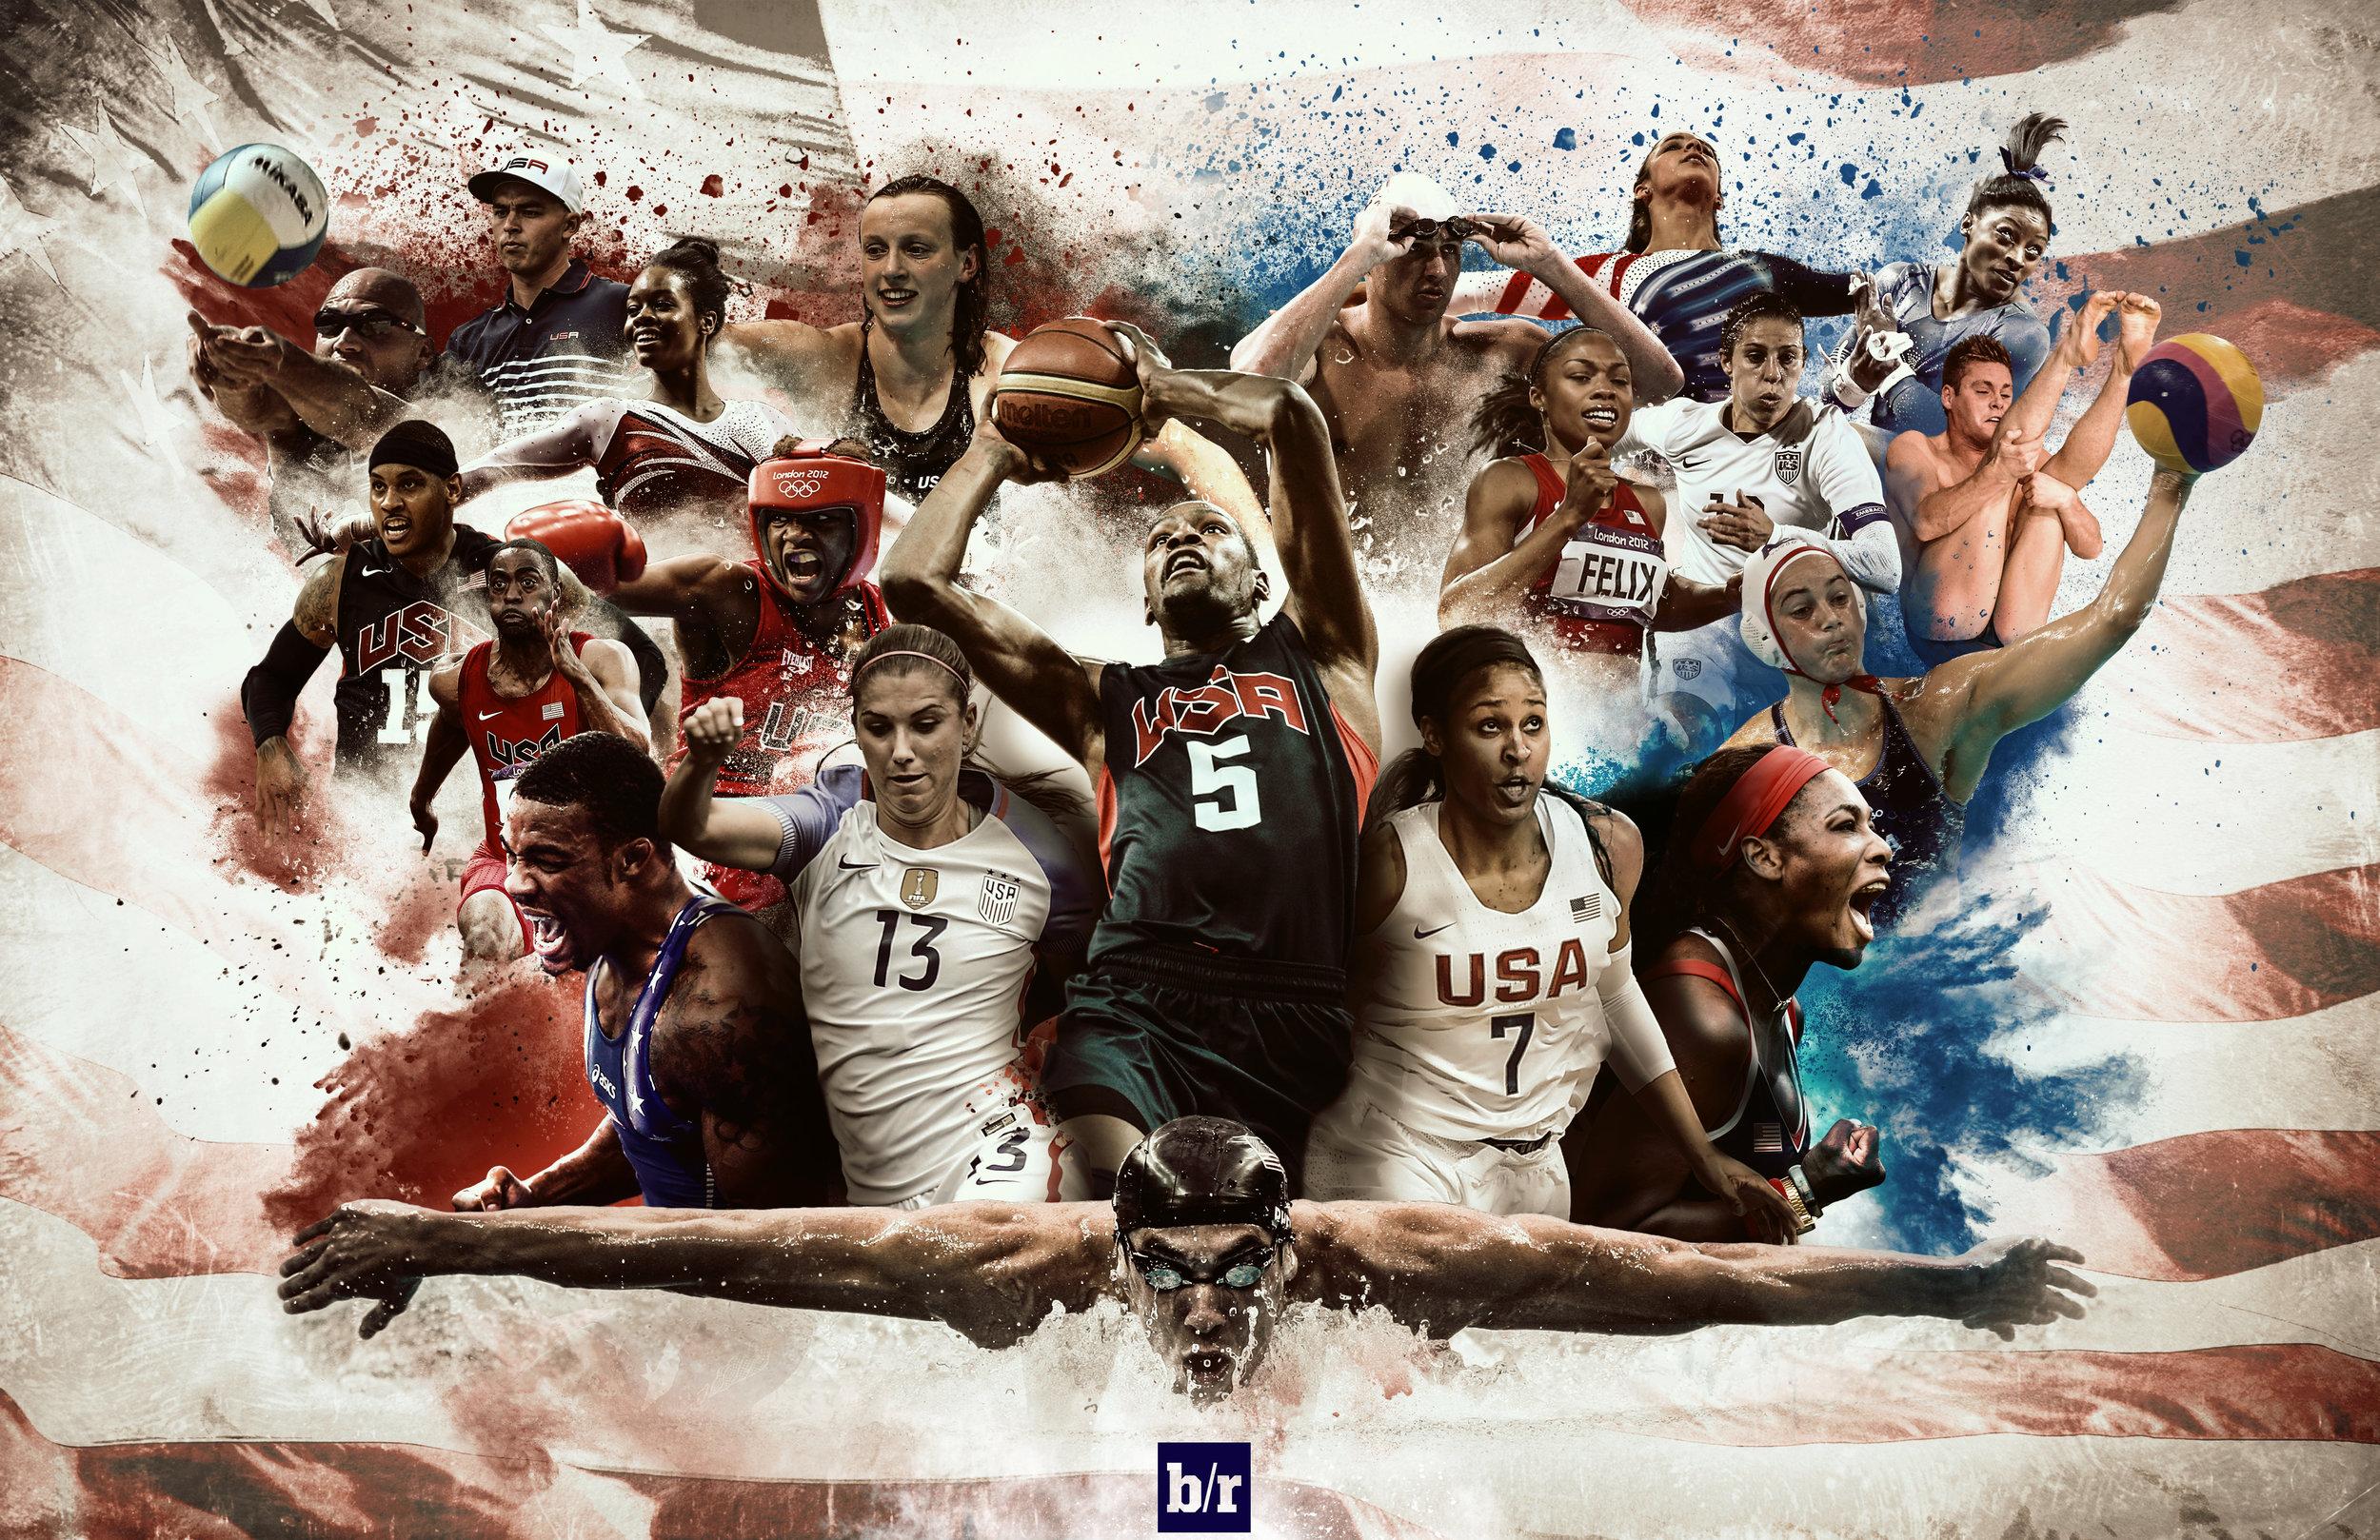 USACollageNoText.jpg